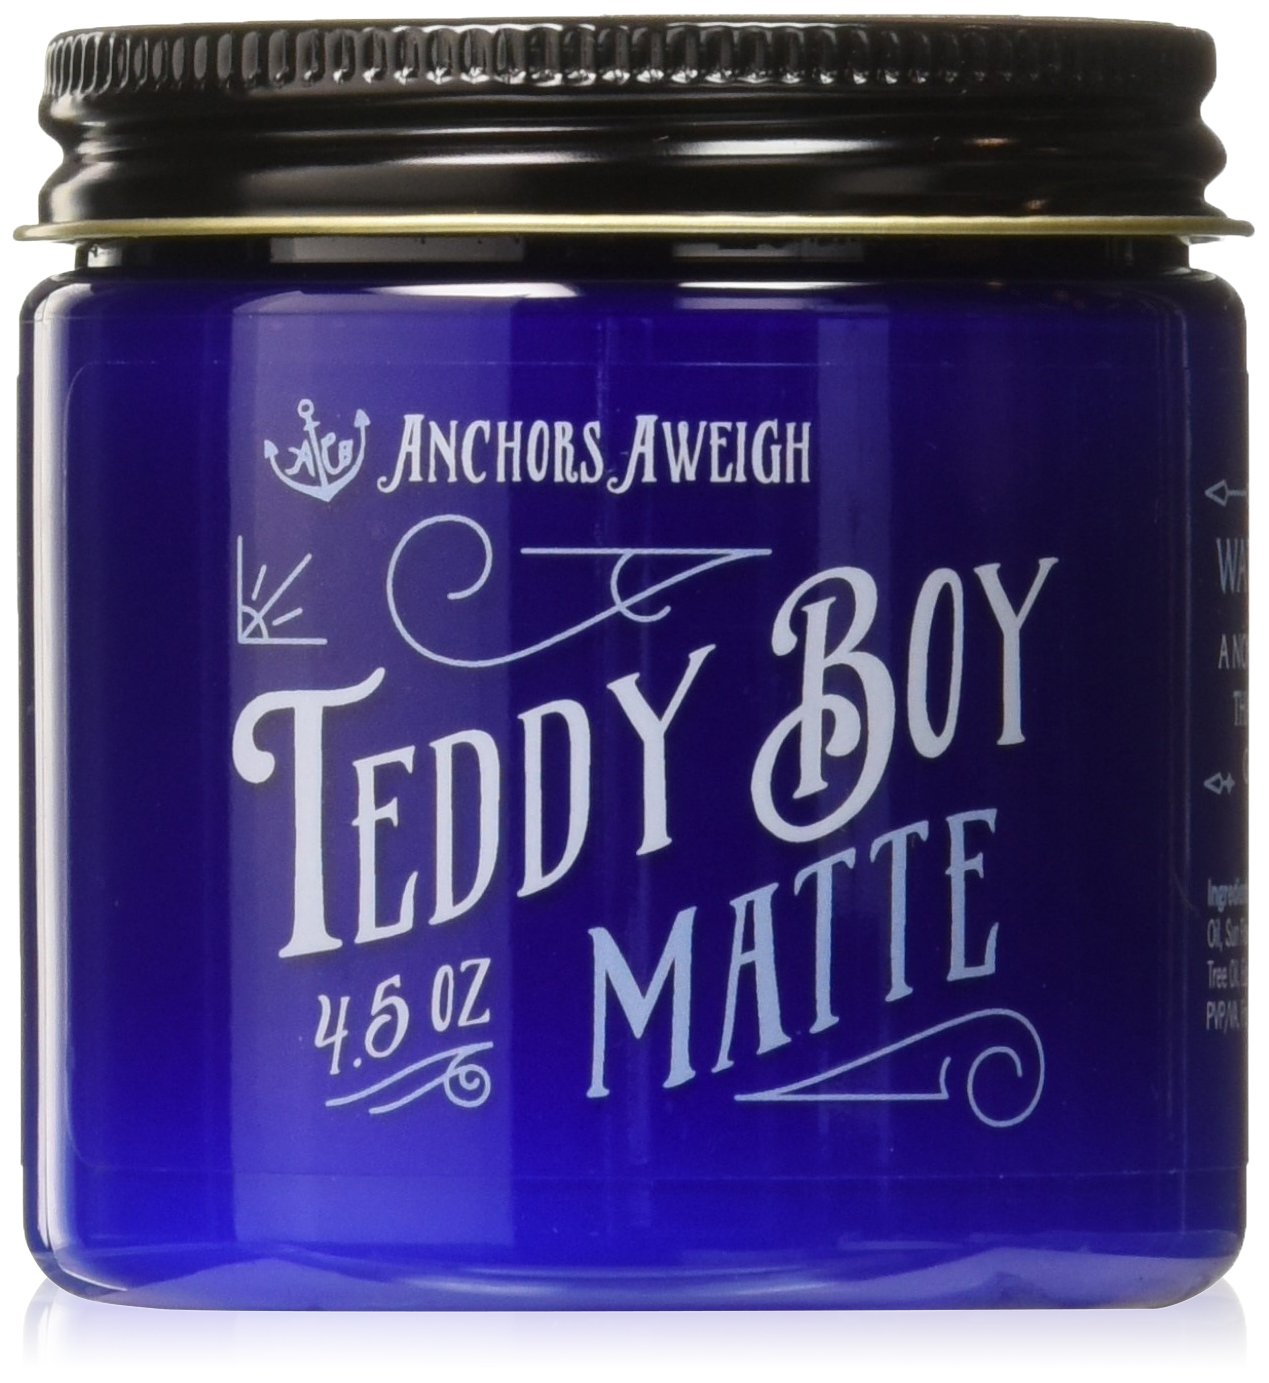 Anchors Hair Company Teddy Boy Water Based Dry Matte Wax, 4.5 oz.